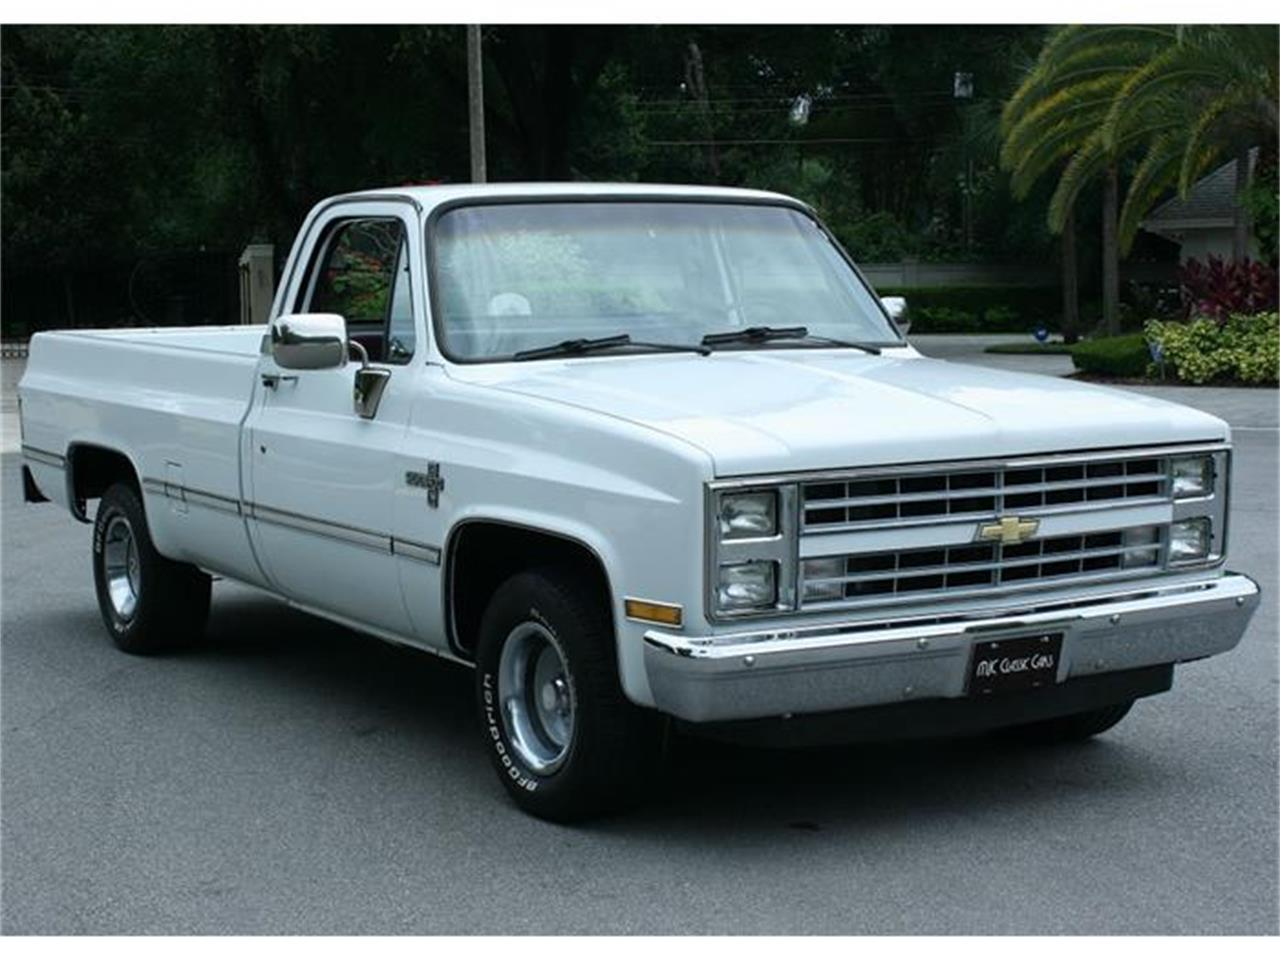 Large Picture of '87 Chevrolet Silverado - $19,500.00 - IQHJ